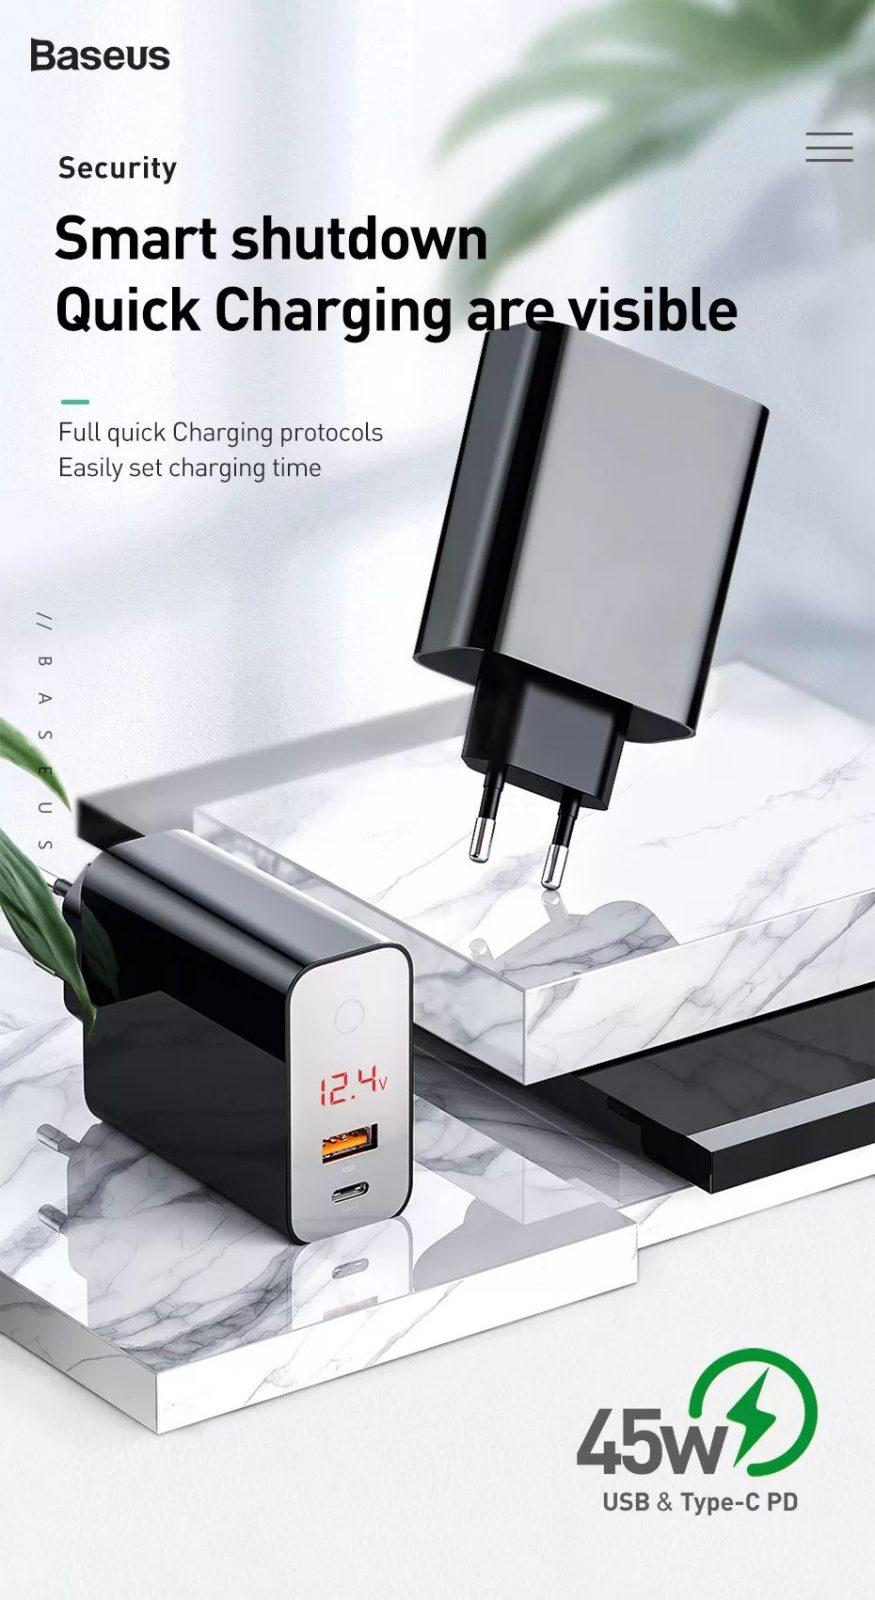 Baseus 45w Smart Shutdown Digital Display Quick Charger (5)